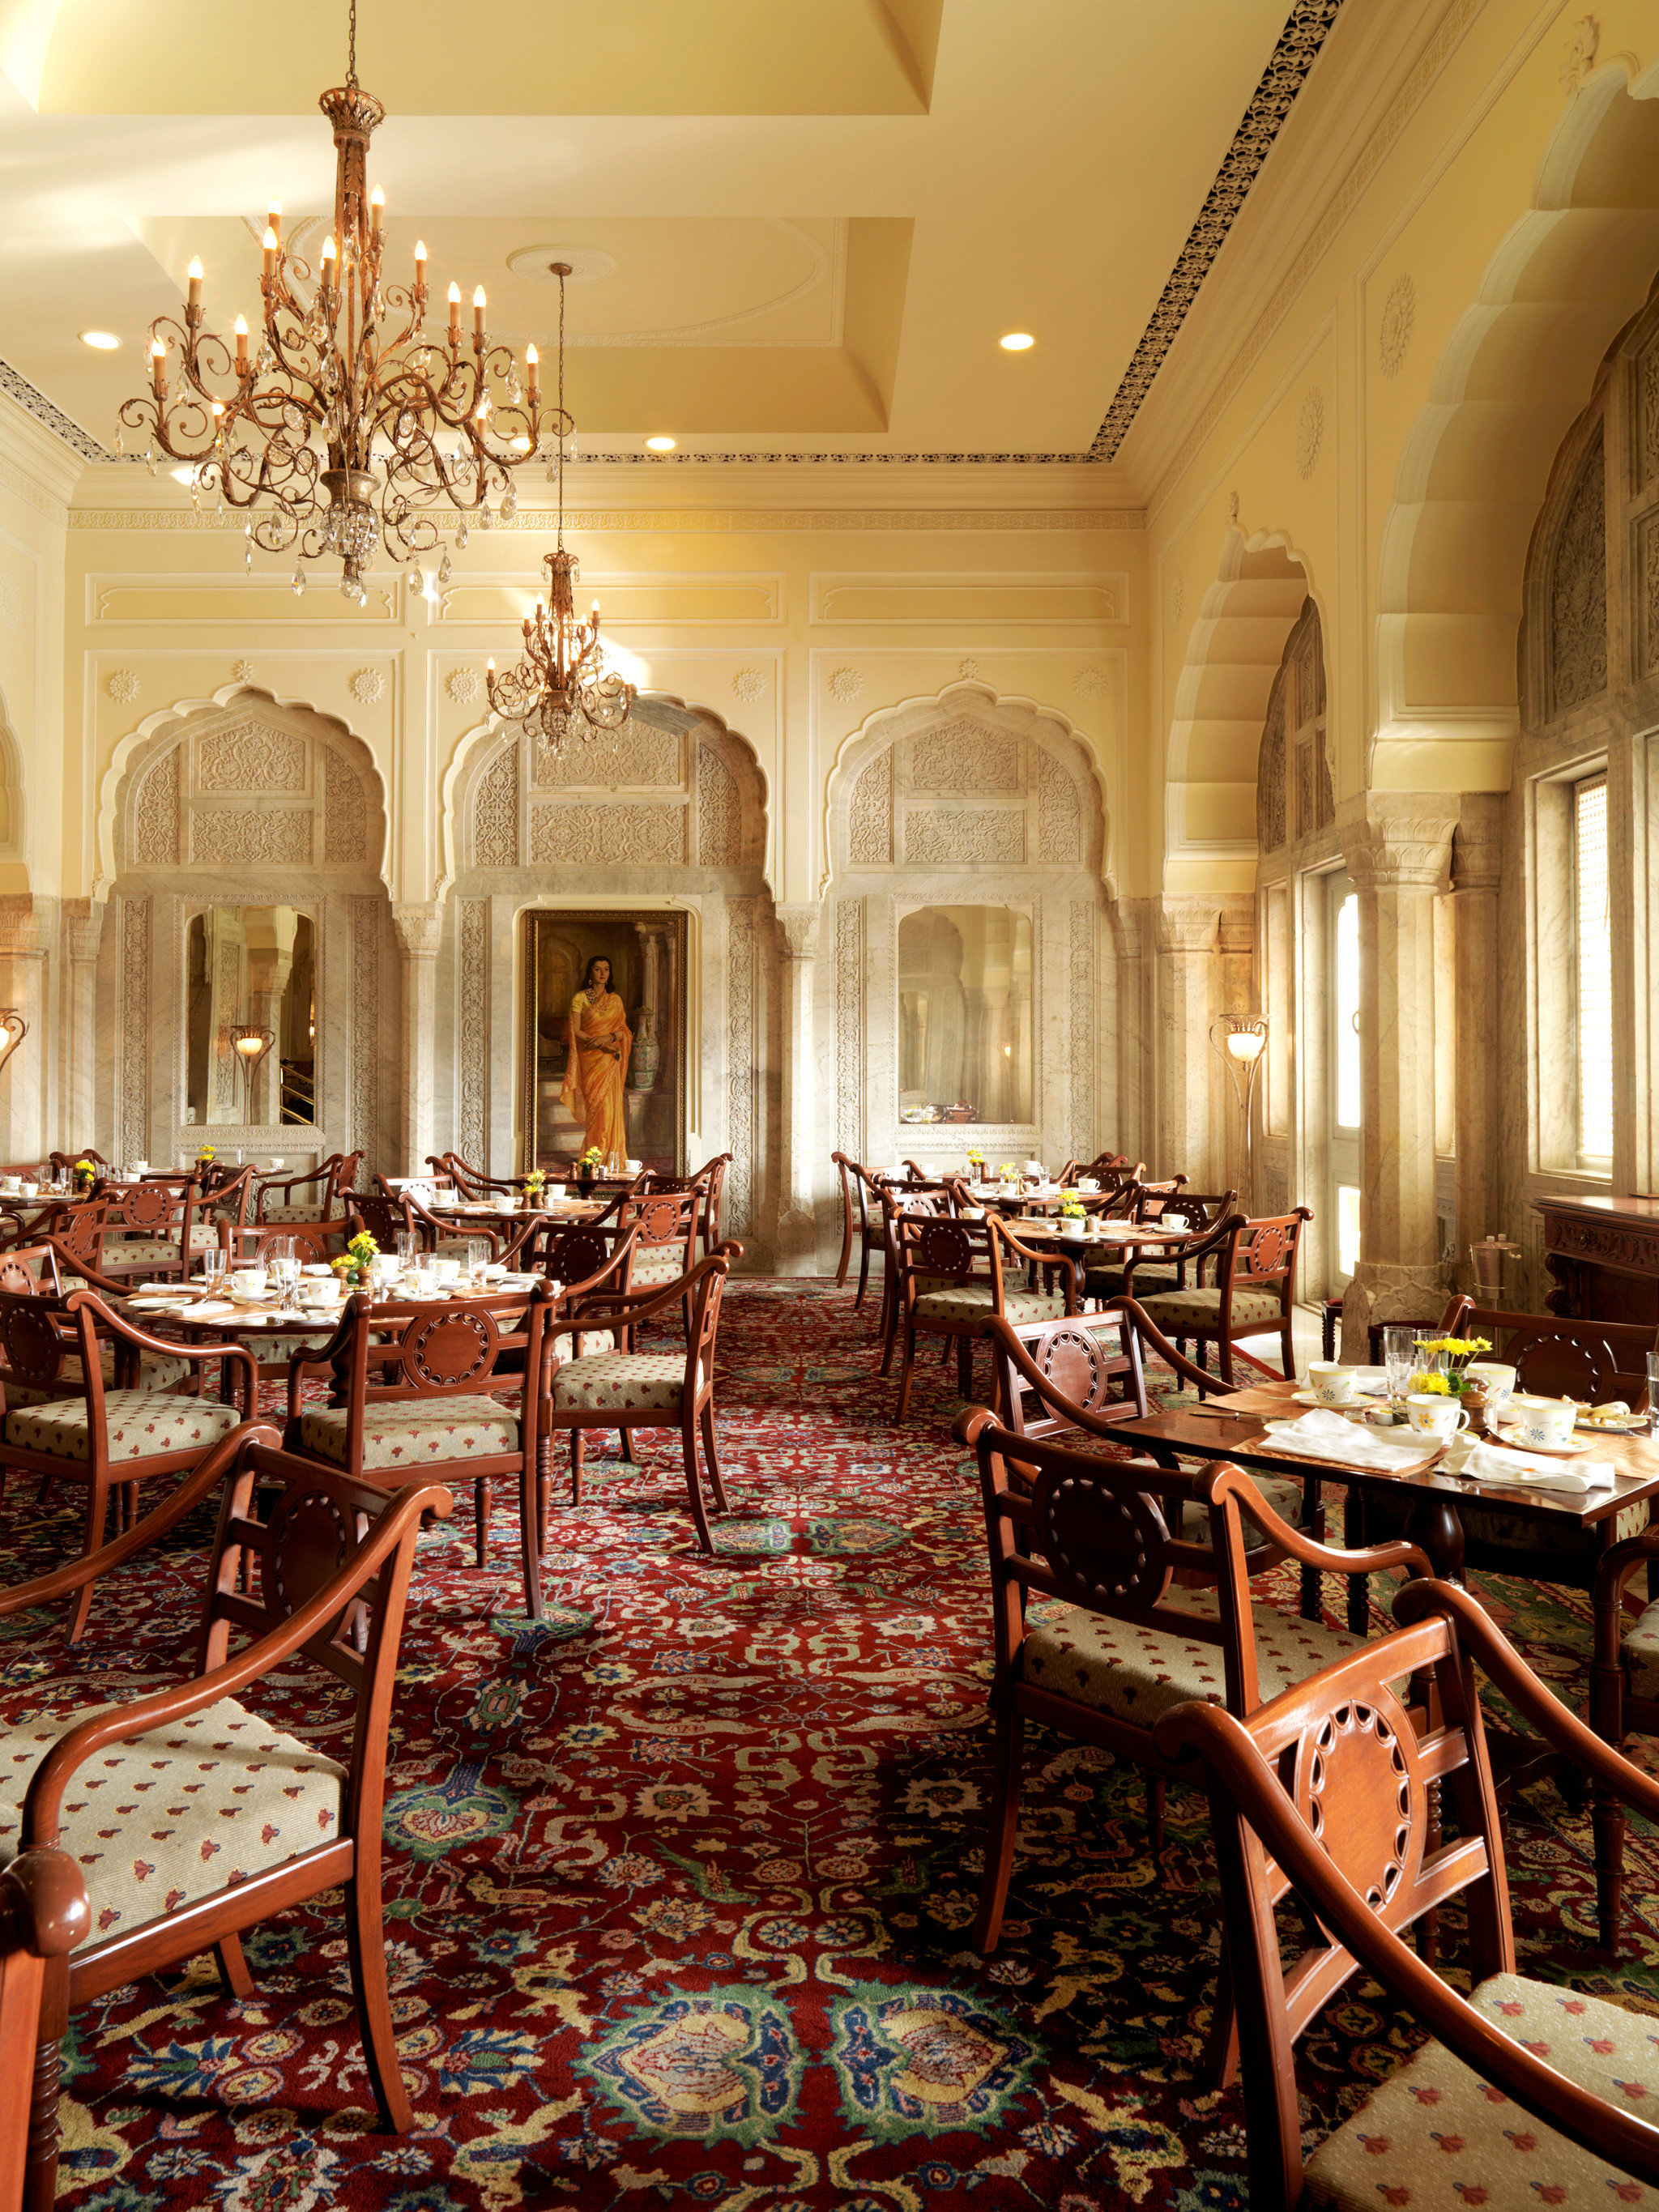 Dining Drink Eat Elegant Luxury Resort chair palace mansion home Lobby function hall ballroom restaurant living room set dining table